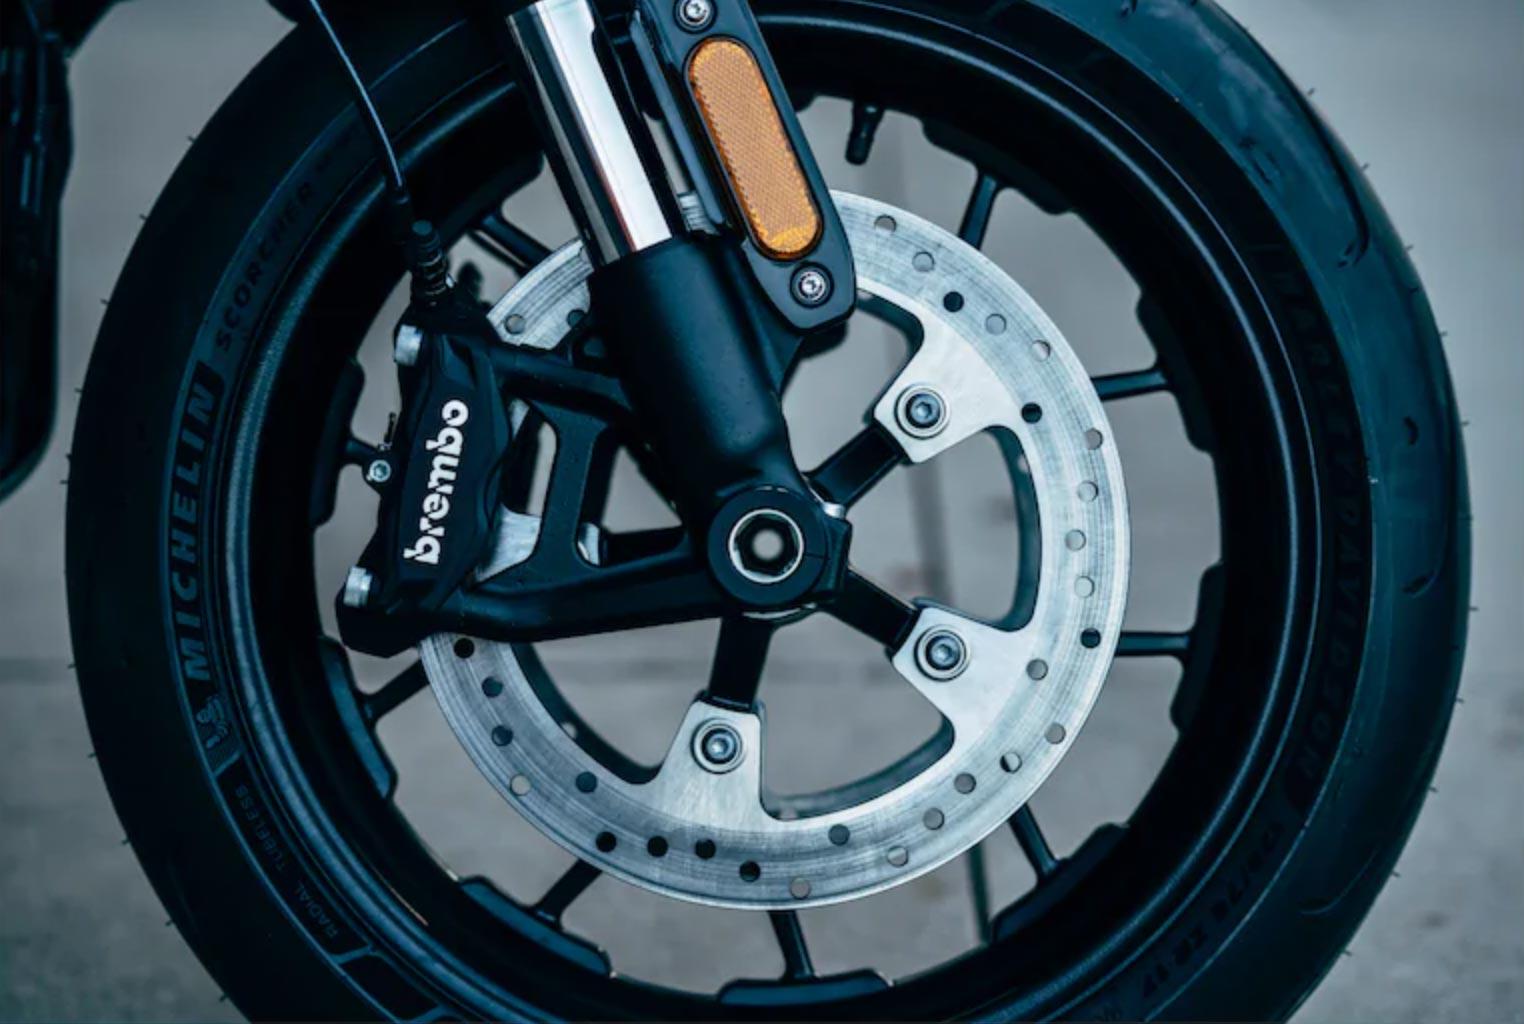 Harley Davidson LiveWire 2019 Review